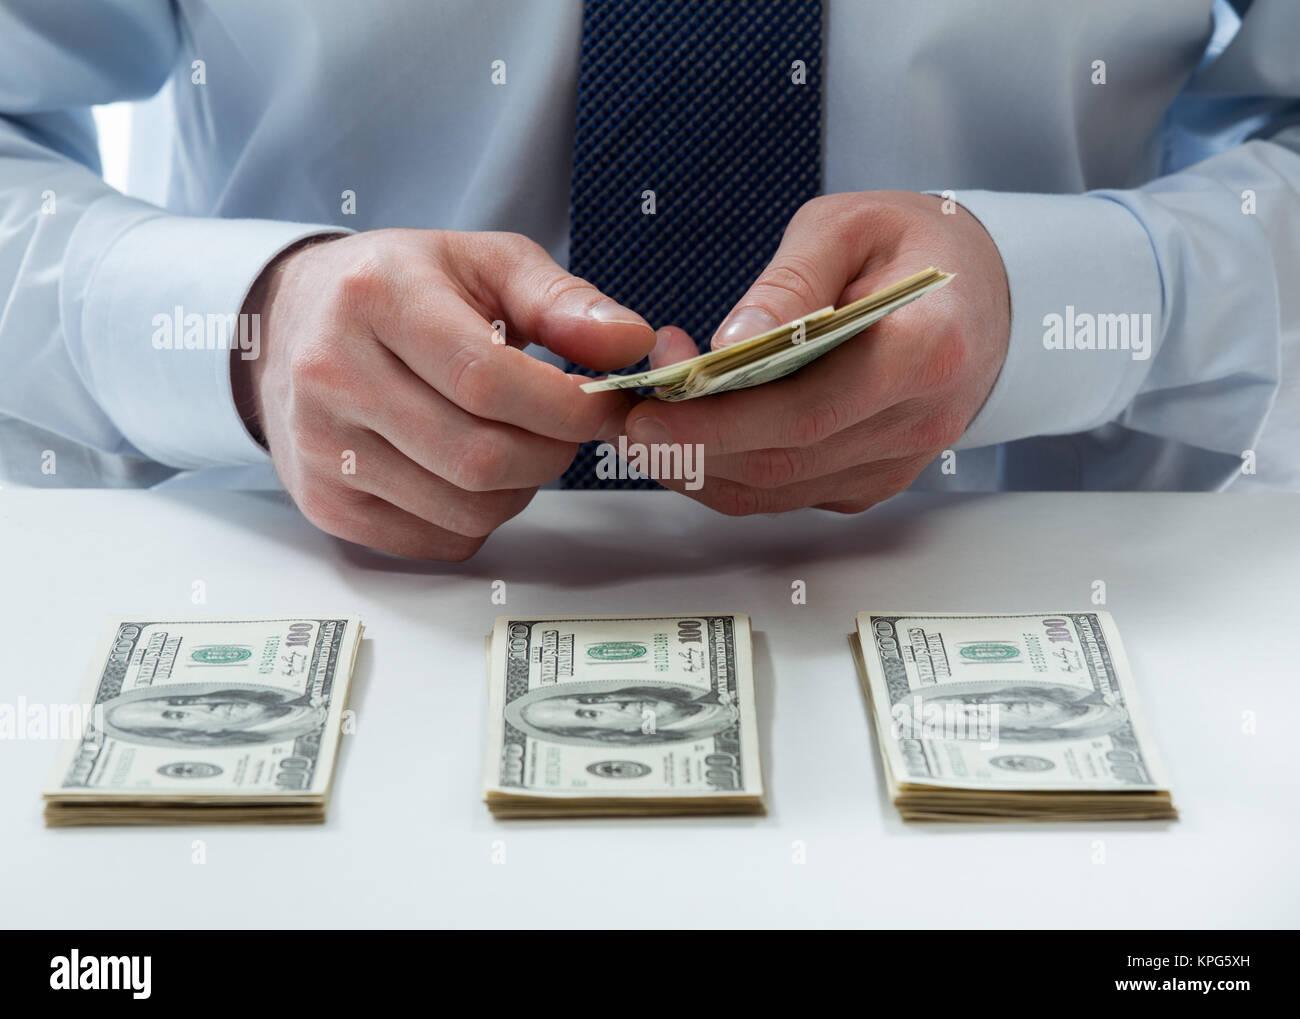 Bank teller counting dollar banknotes - Stock Image